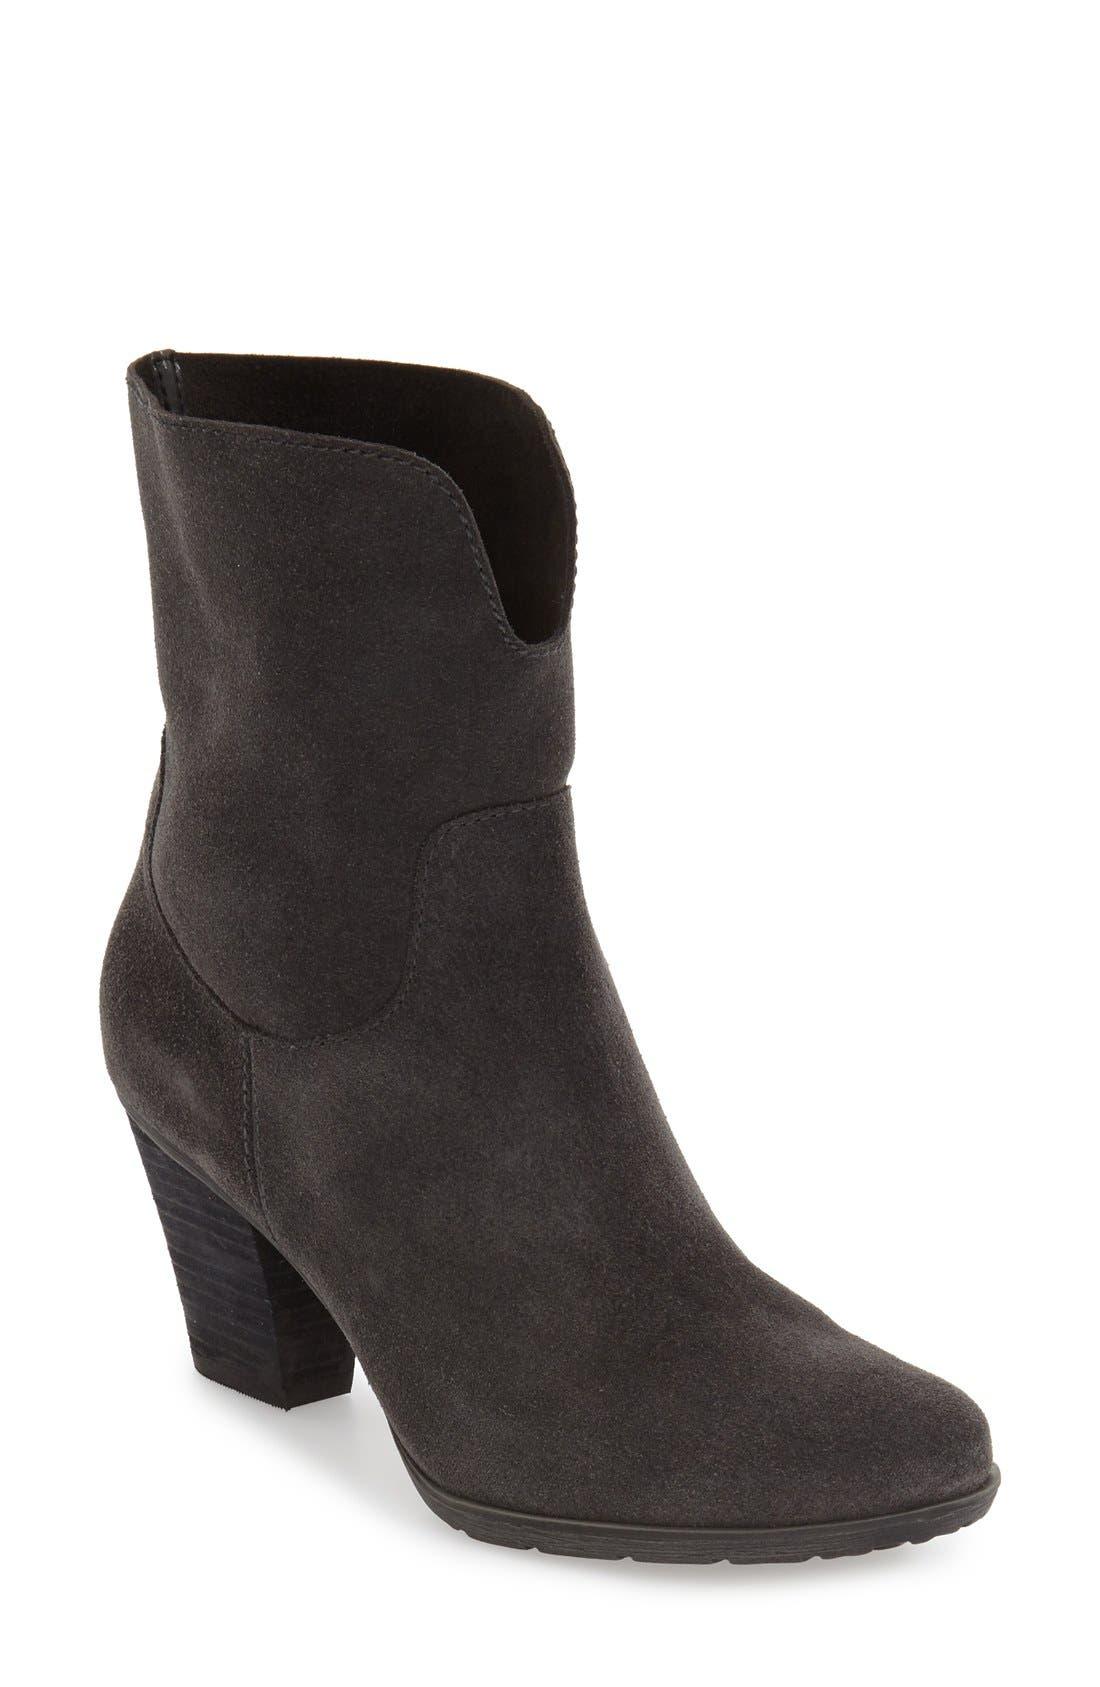 BLONDO Fay Waterproof Ankle Boot